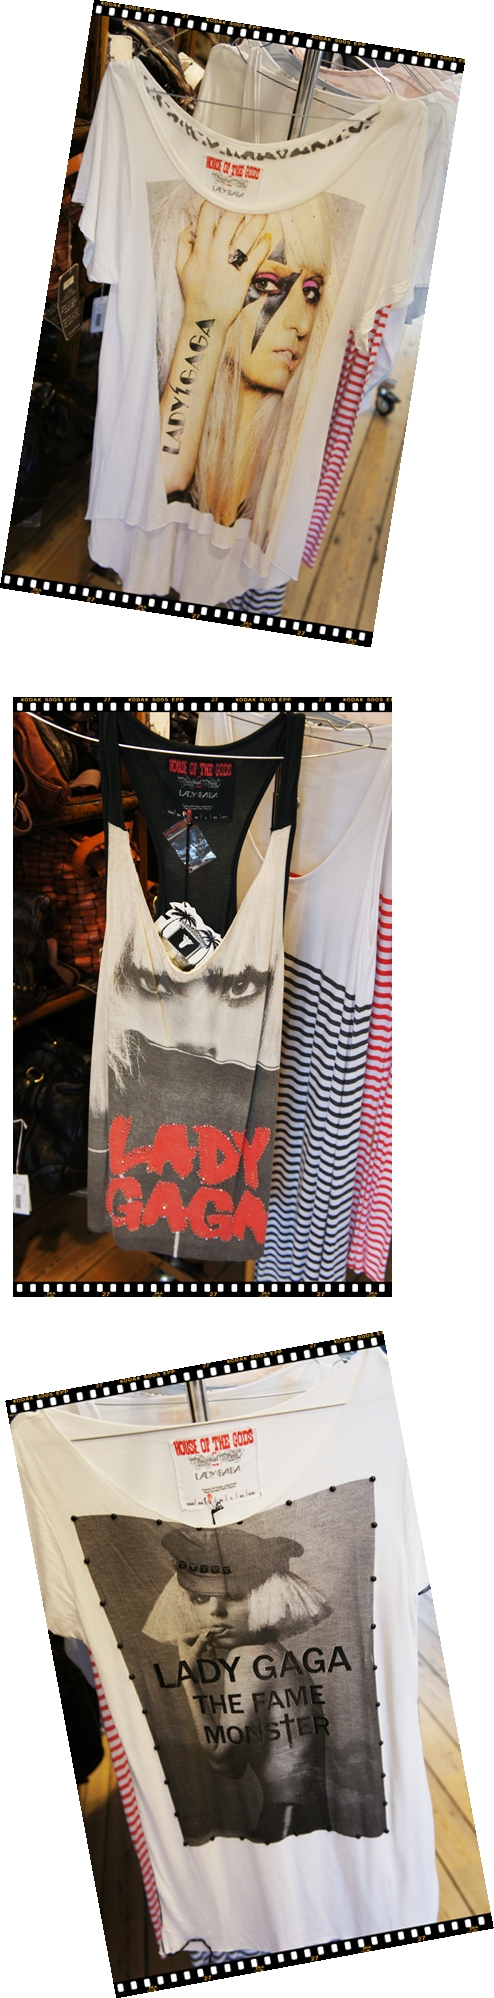 lady gaga t-shirt, house of the gods